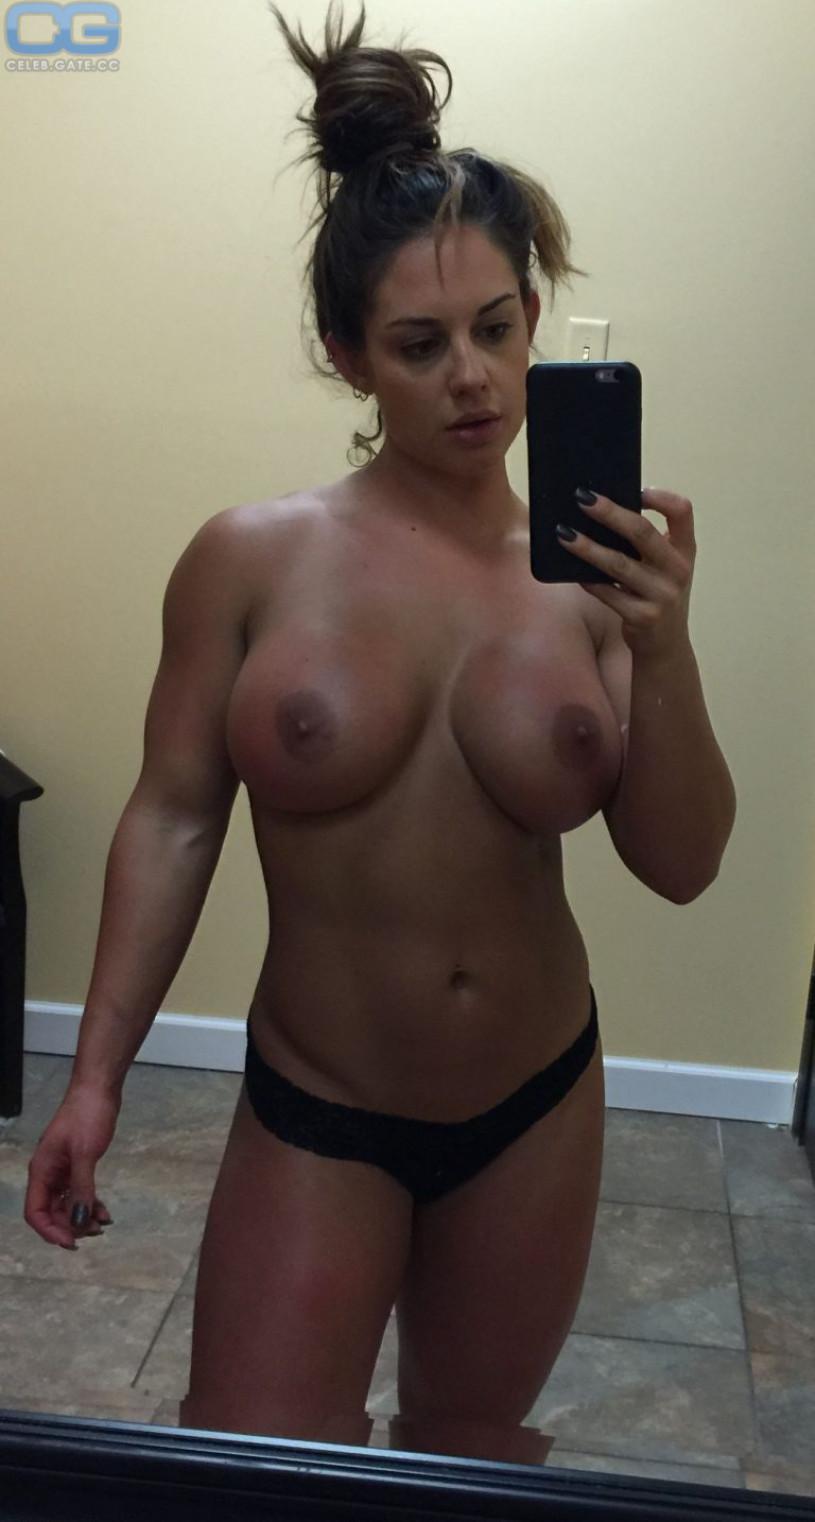 Tan pantyhosed nude